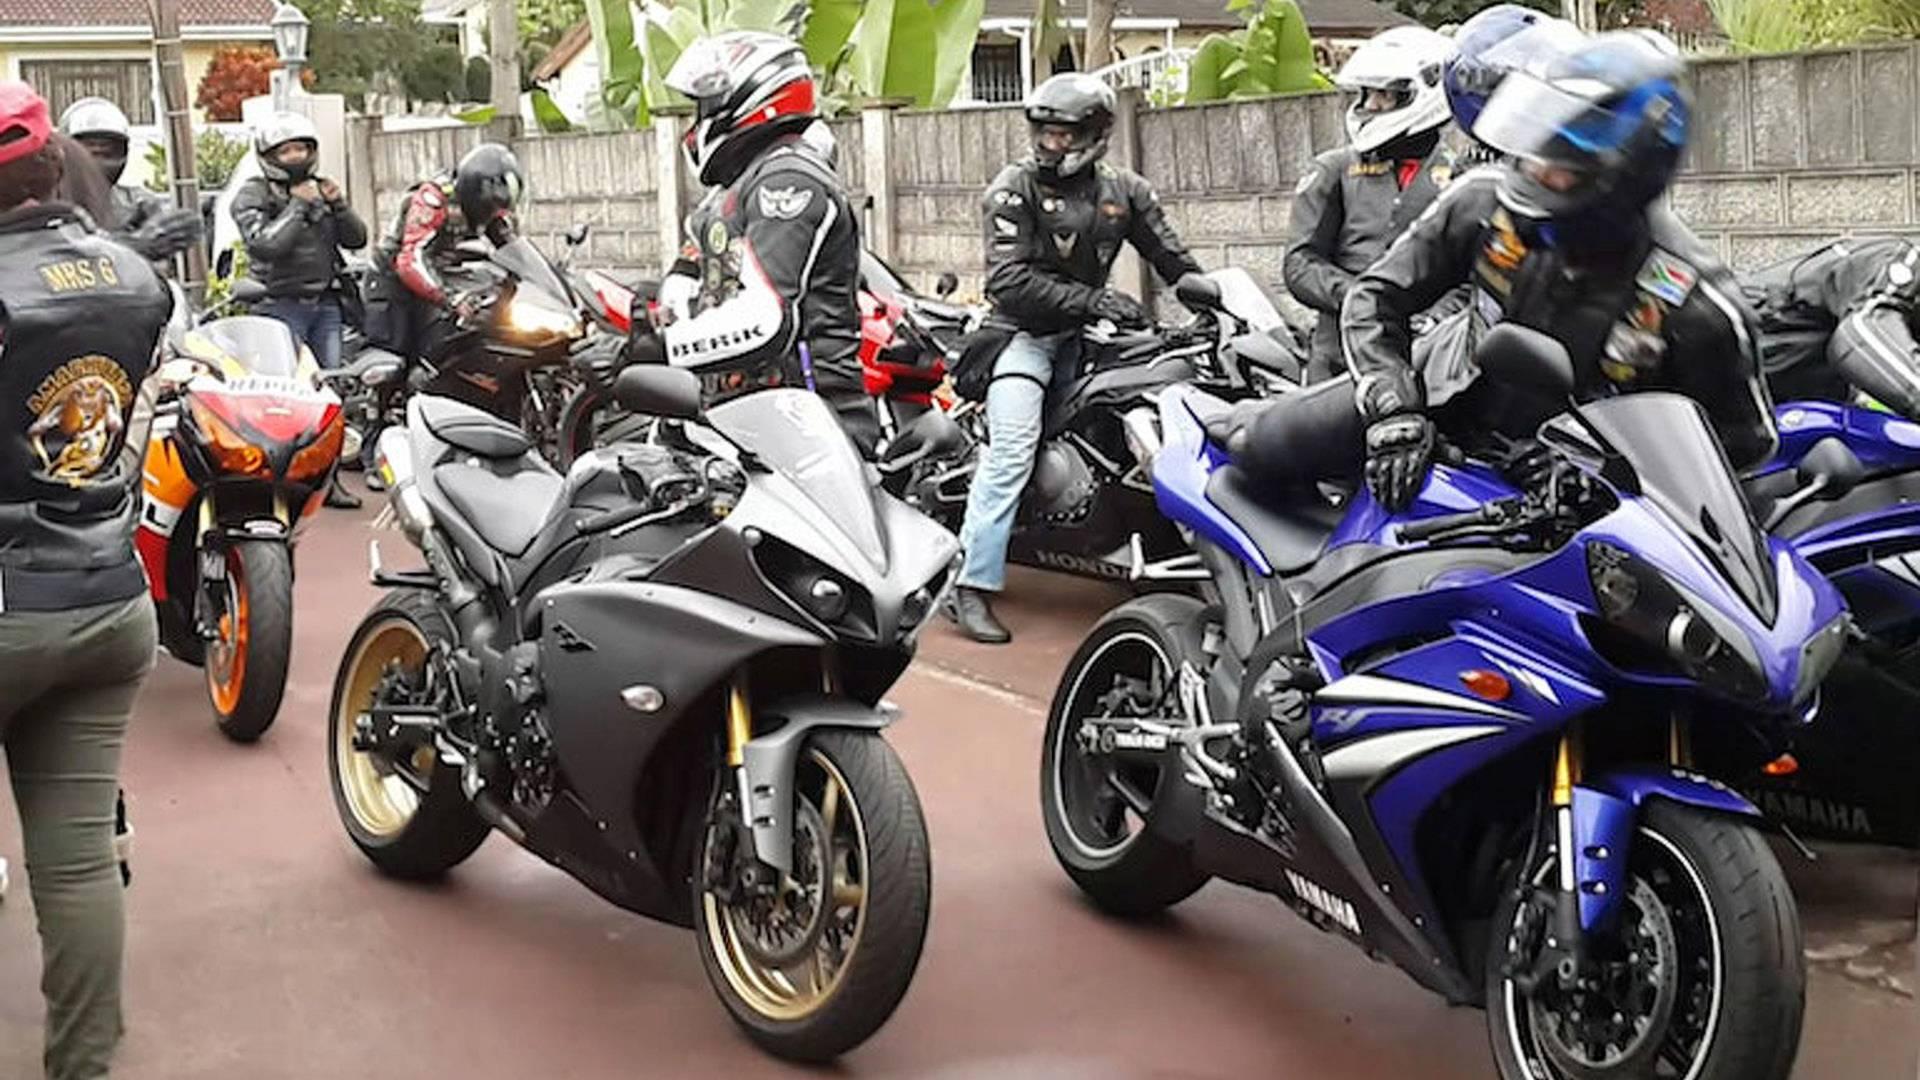 Motorcycle Sales Boom in Africa